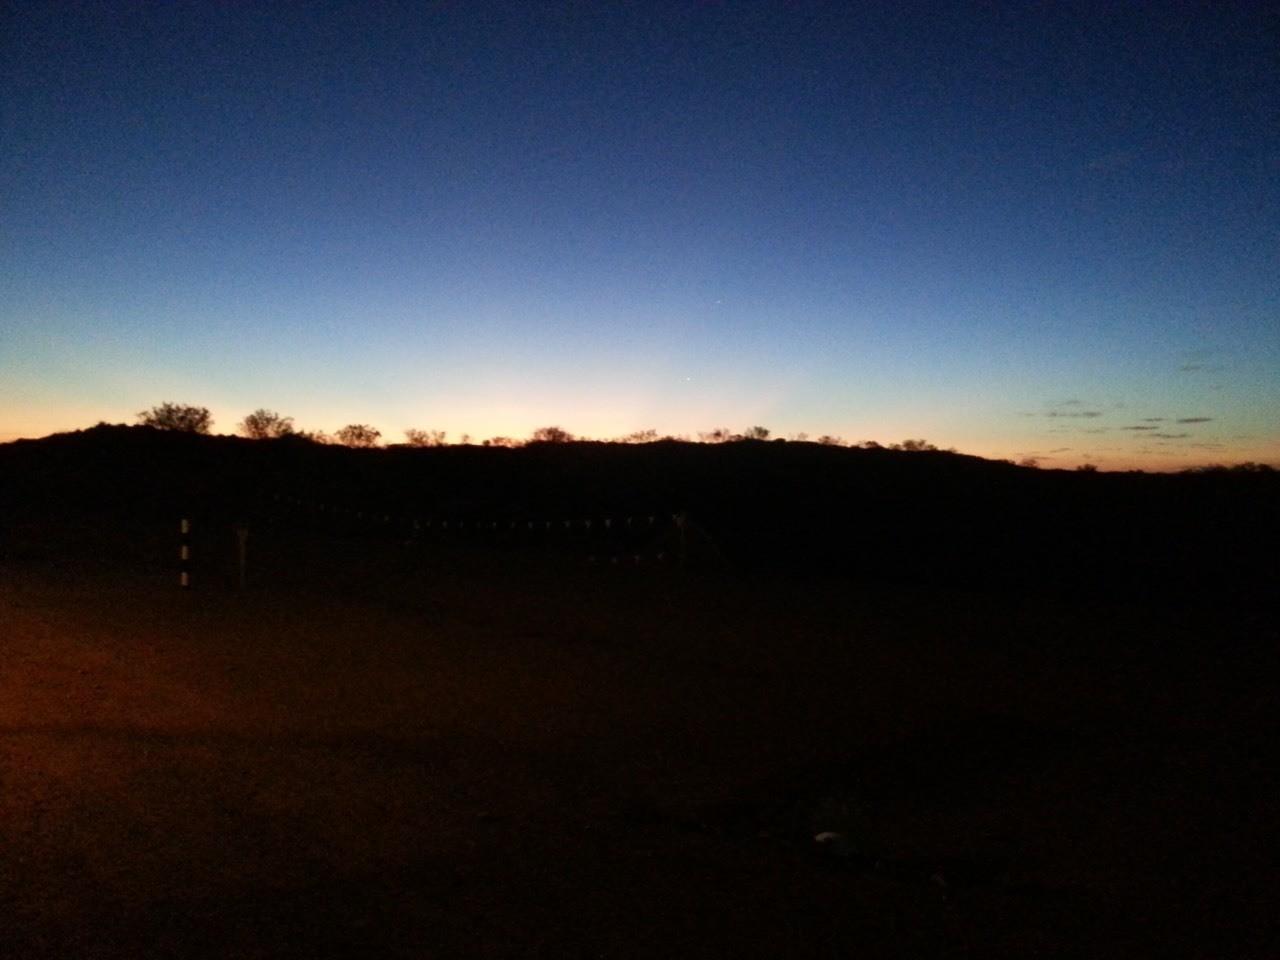 W.a sunset